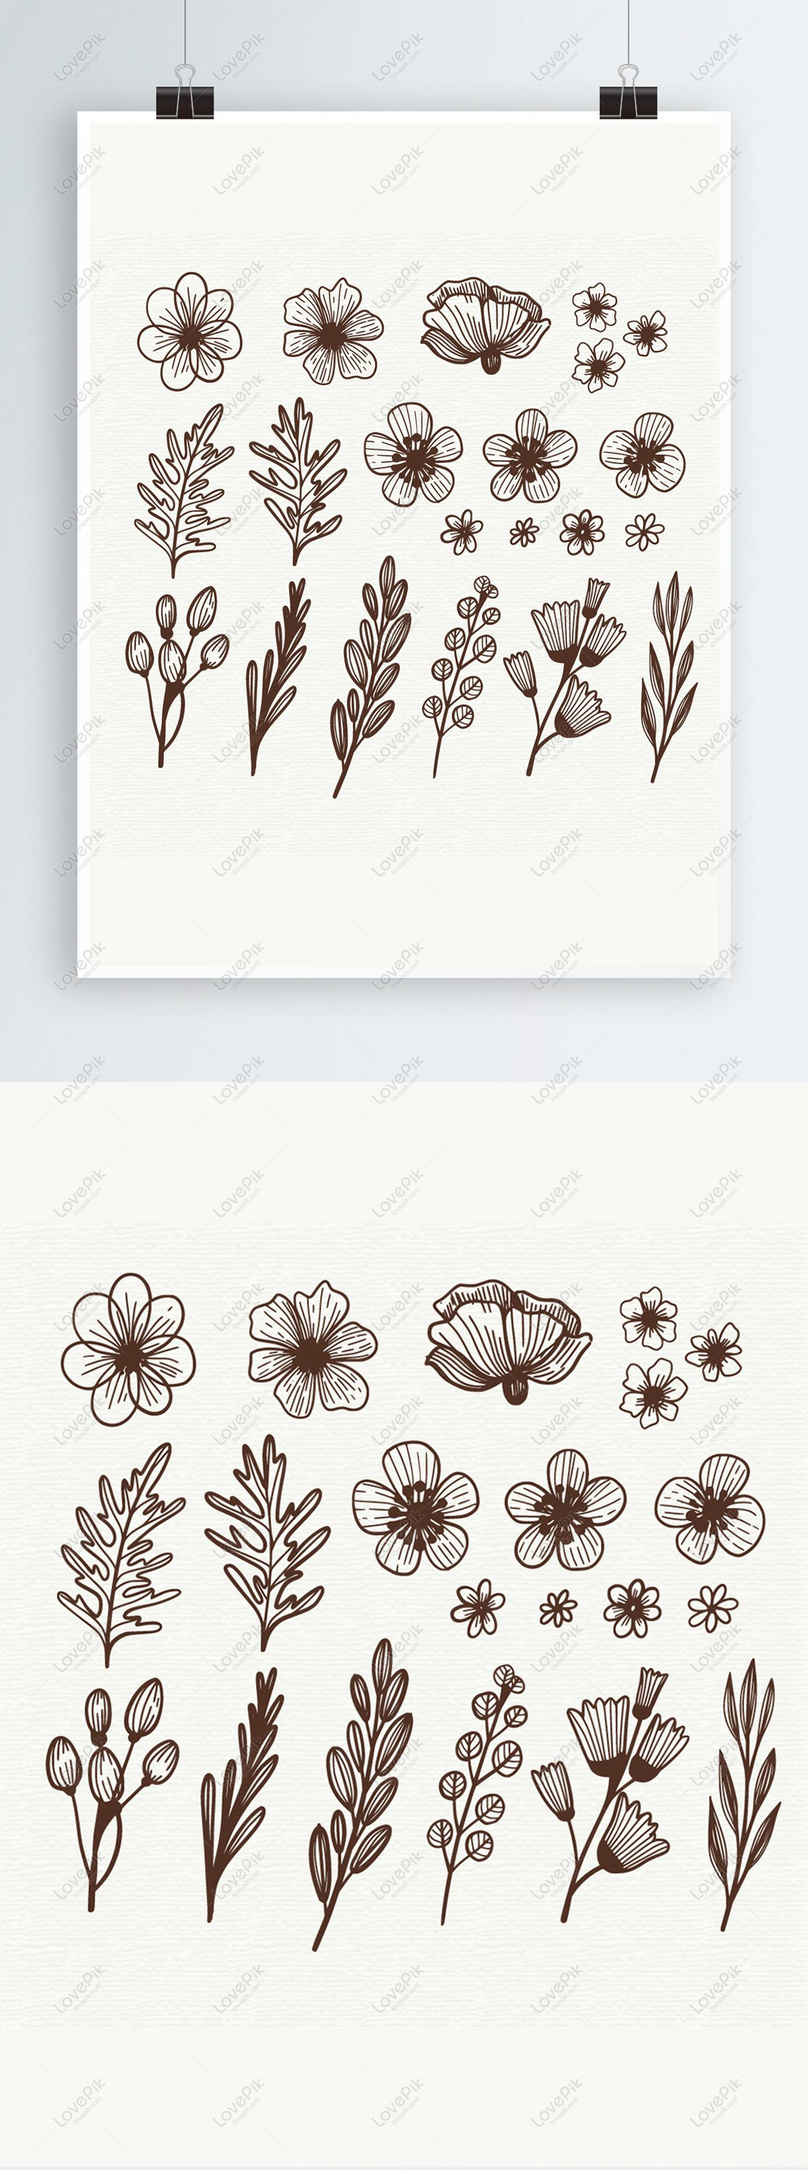 Elemen Bunga A Sketsa Yang Digambar Tangan Gambar Unduh